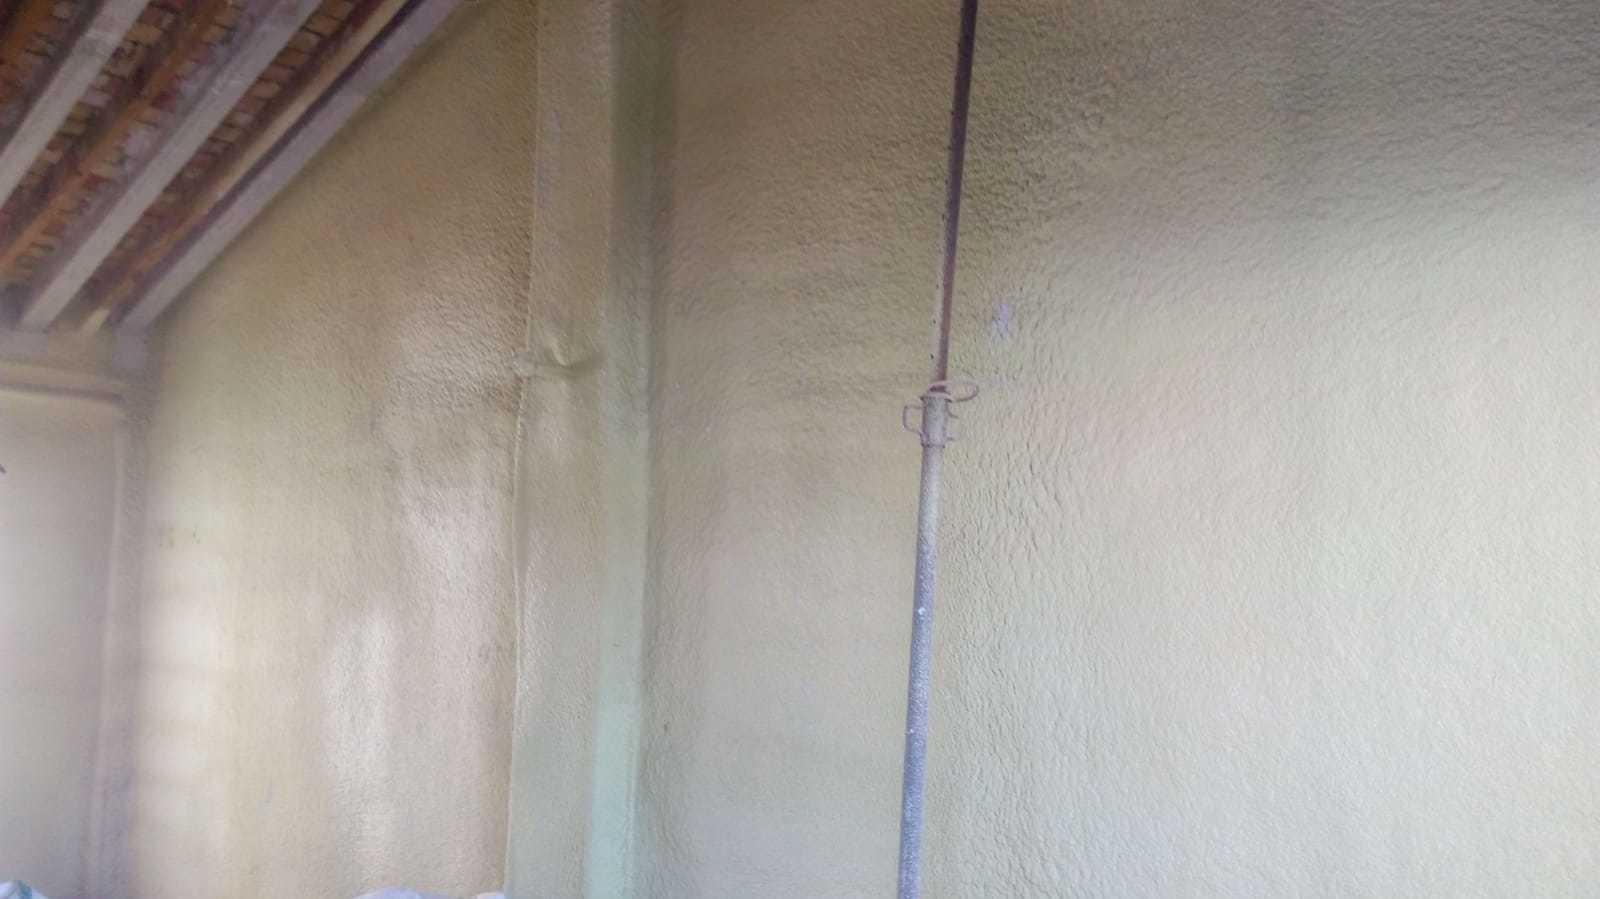 Foto 14 de Aislamientos acústicos y térmicos en Rafelcofer | Aislamientos de Poliuretano Jaime Femenia